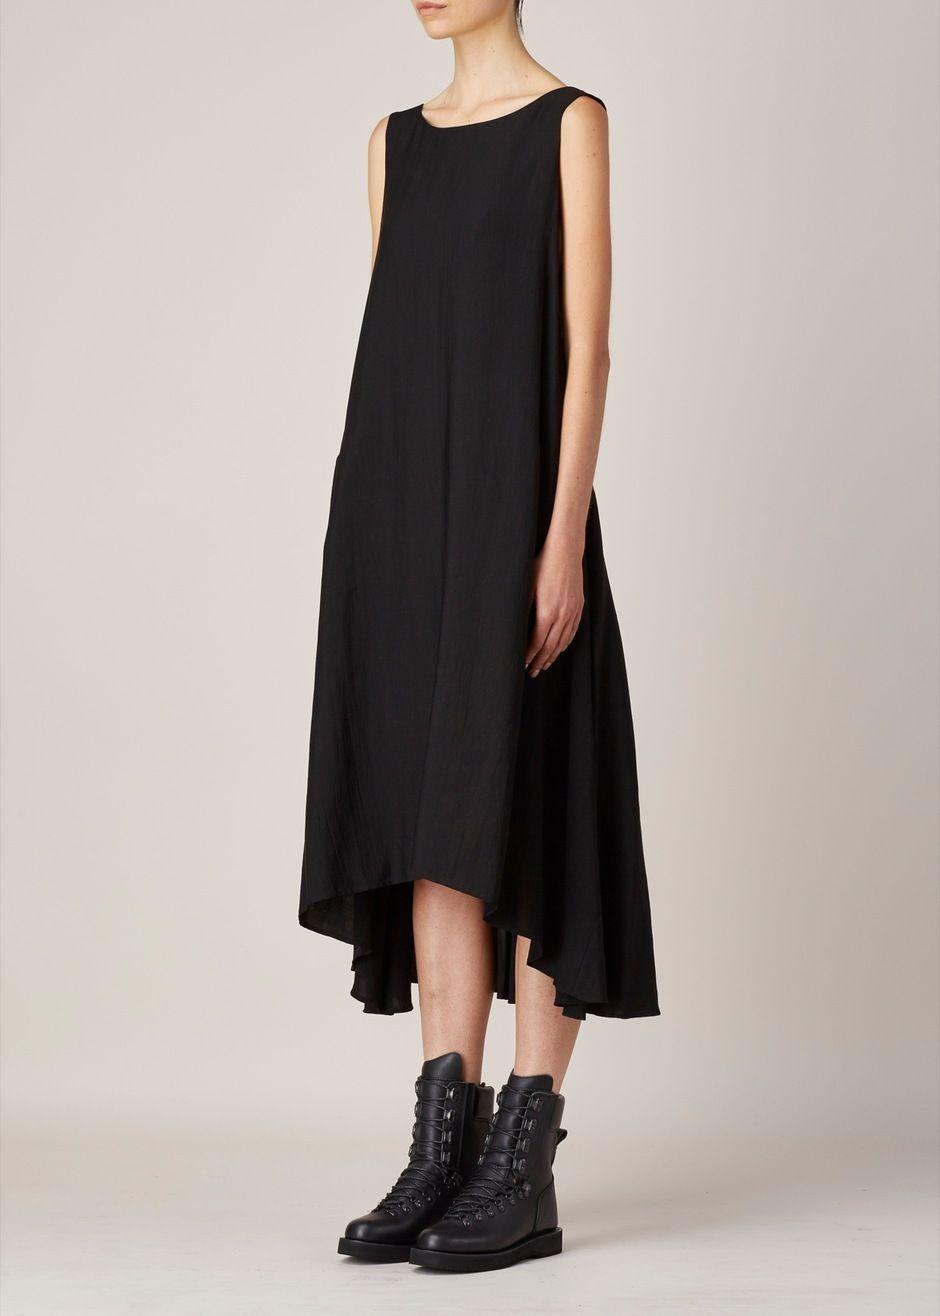 Yus by yohji yamamoto aline dress black abiti casual